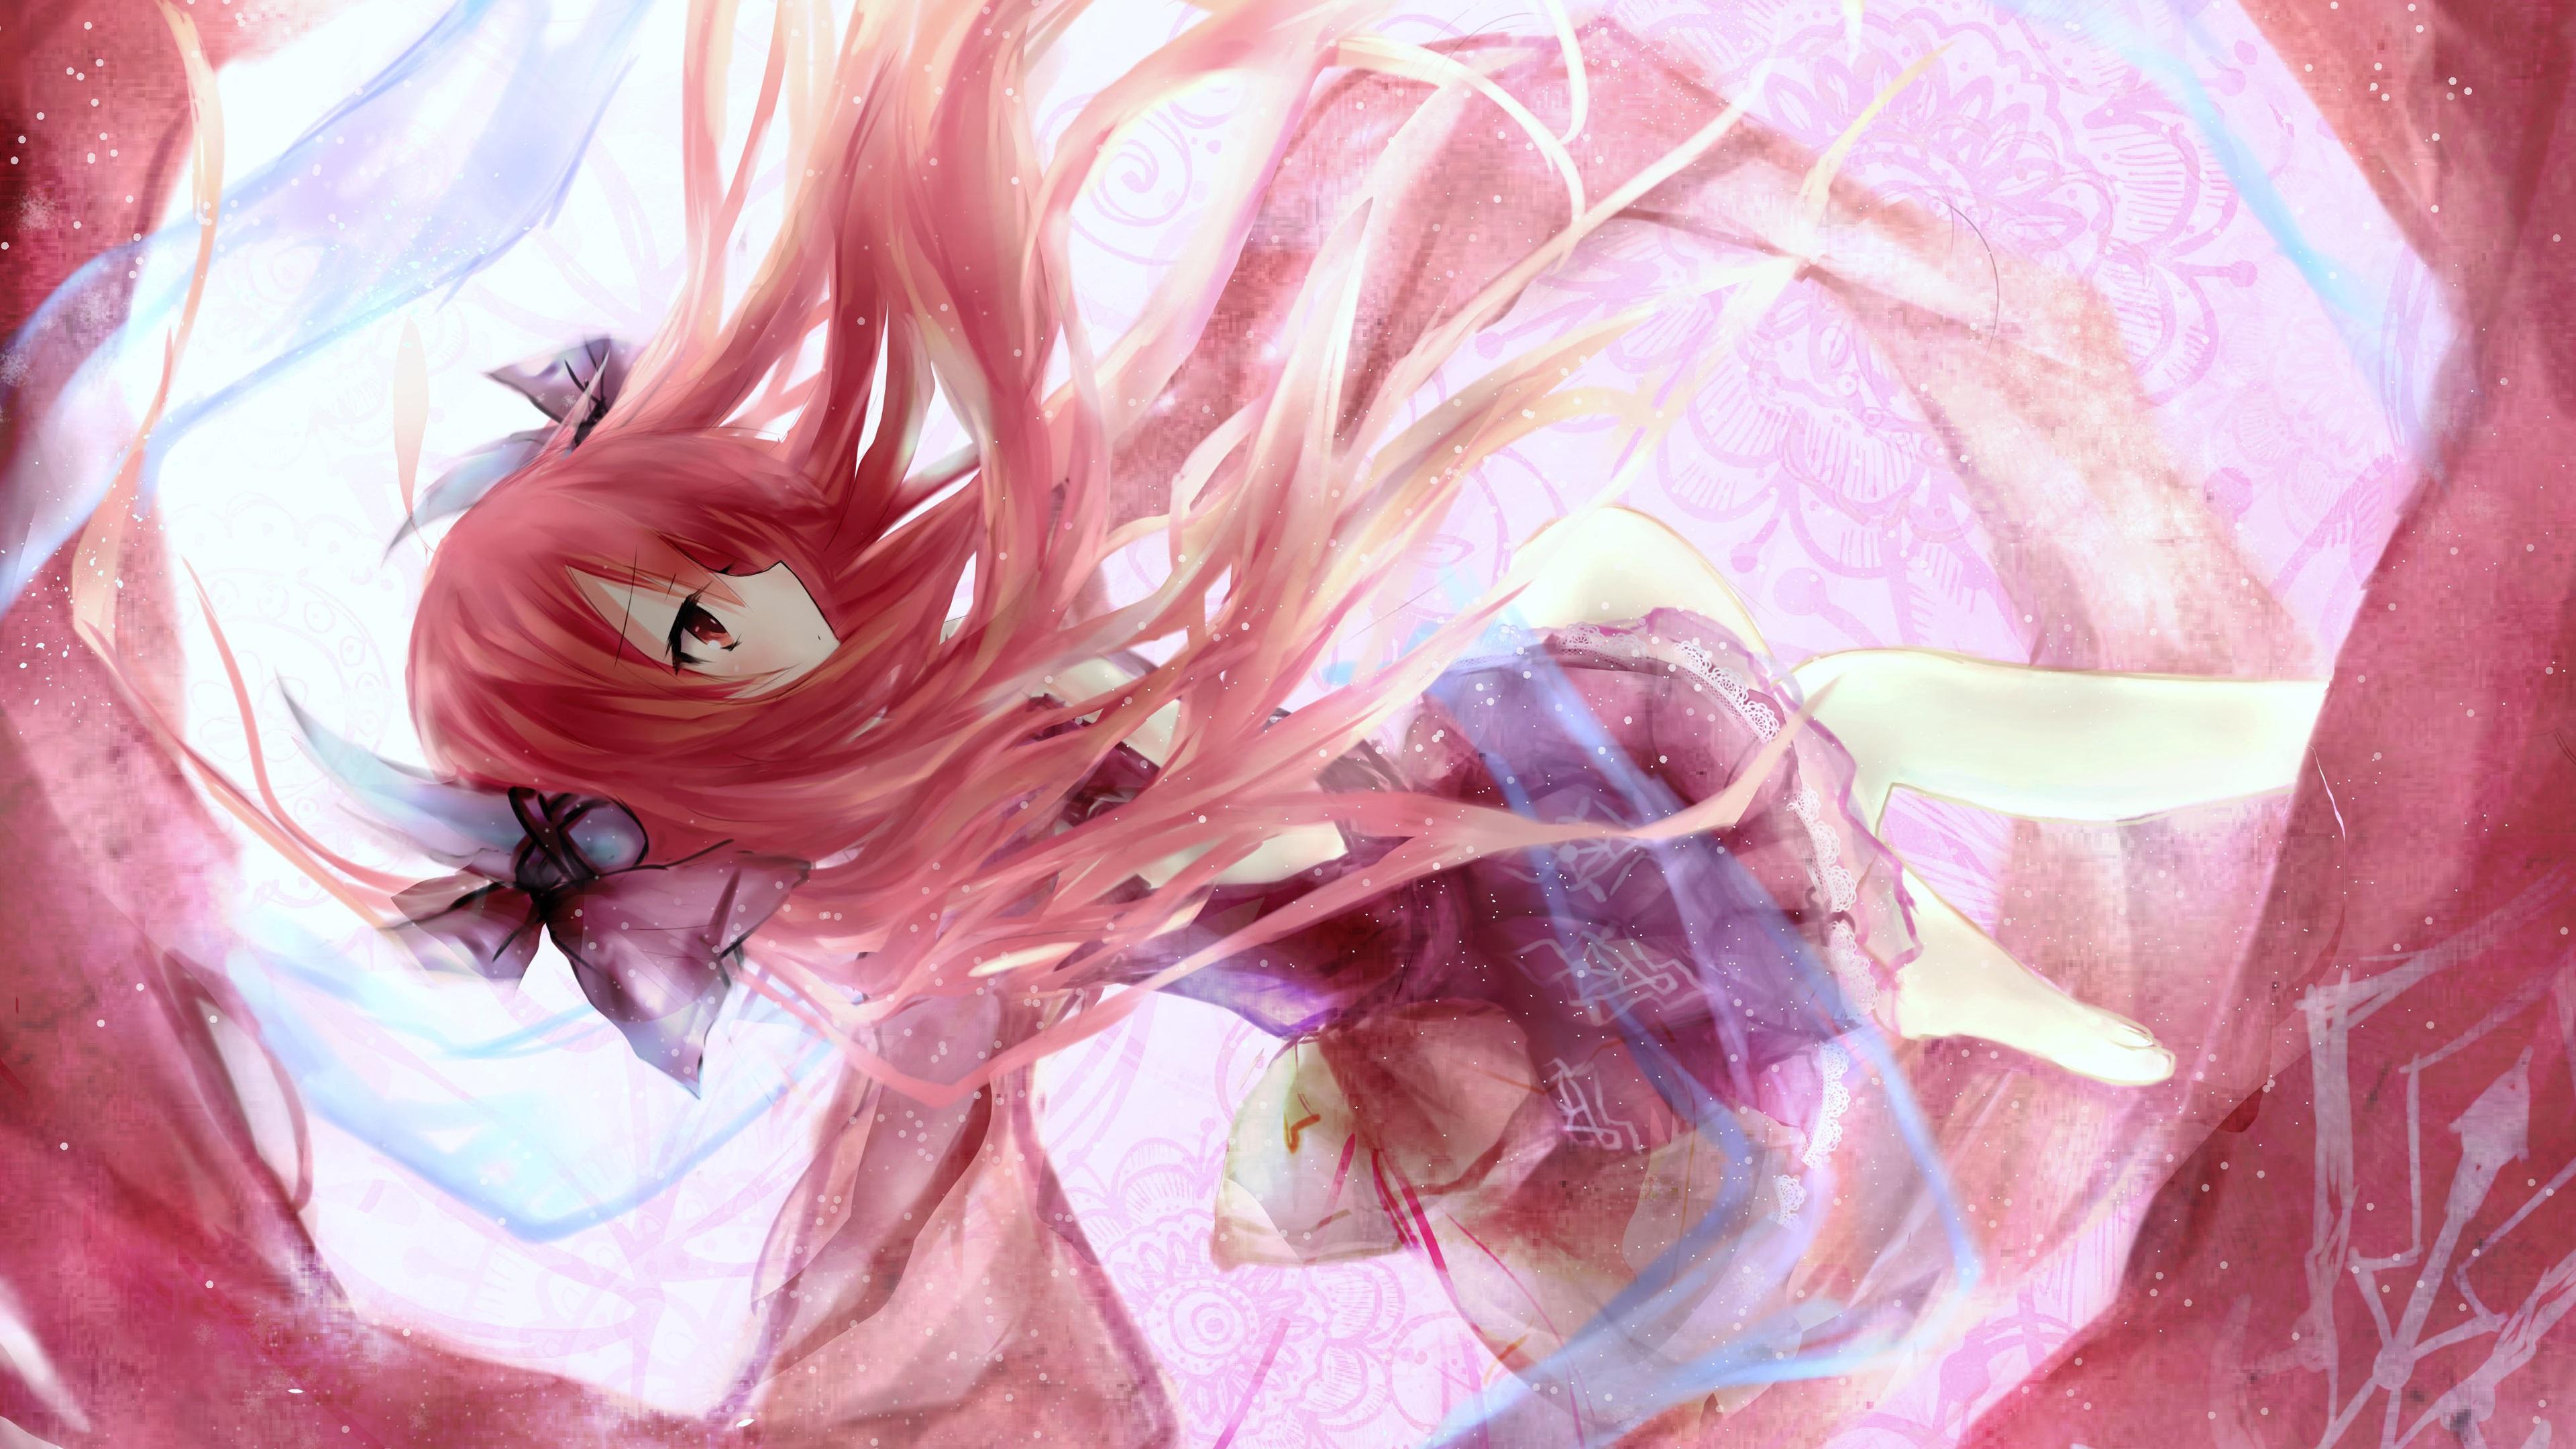 Iphone 3gs Wallpaper Hd 壁纸 粉红色的头发动漫女孩跳舞 3840x2160 Uhd 4k 高清壁纸 图片 照片